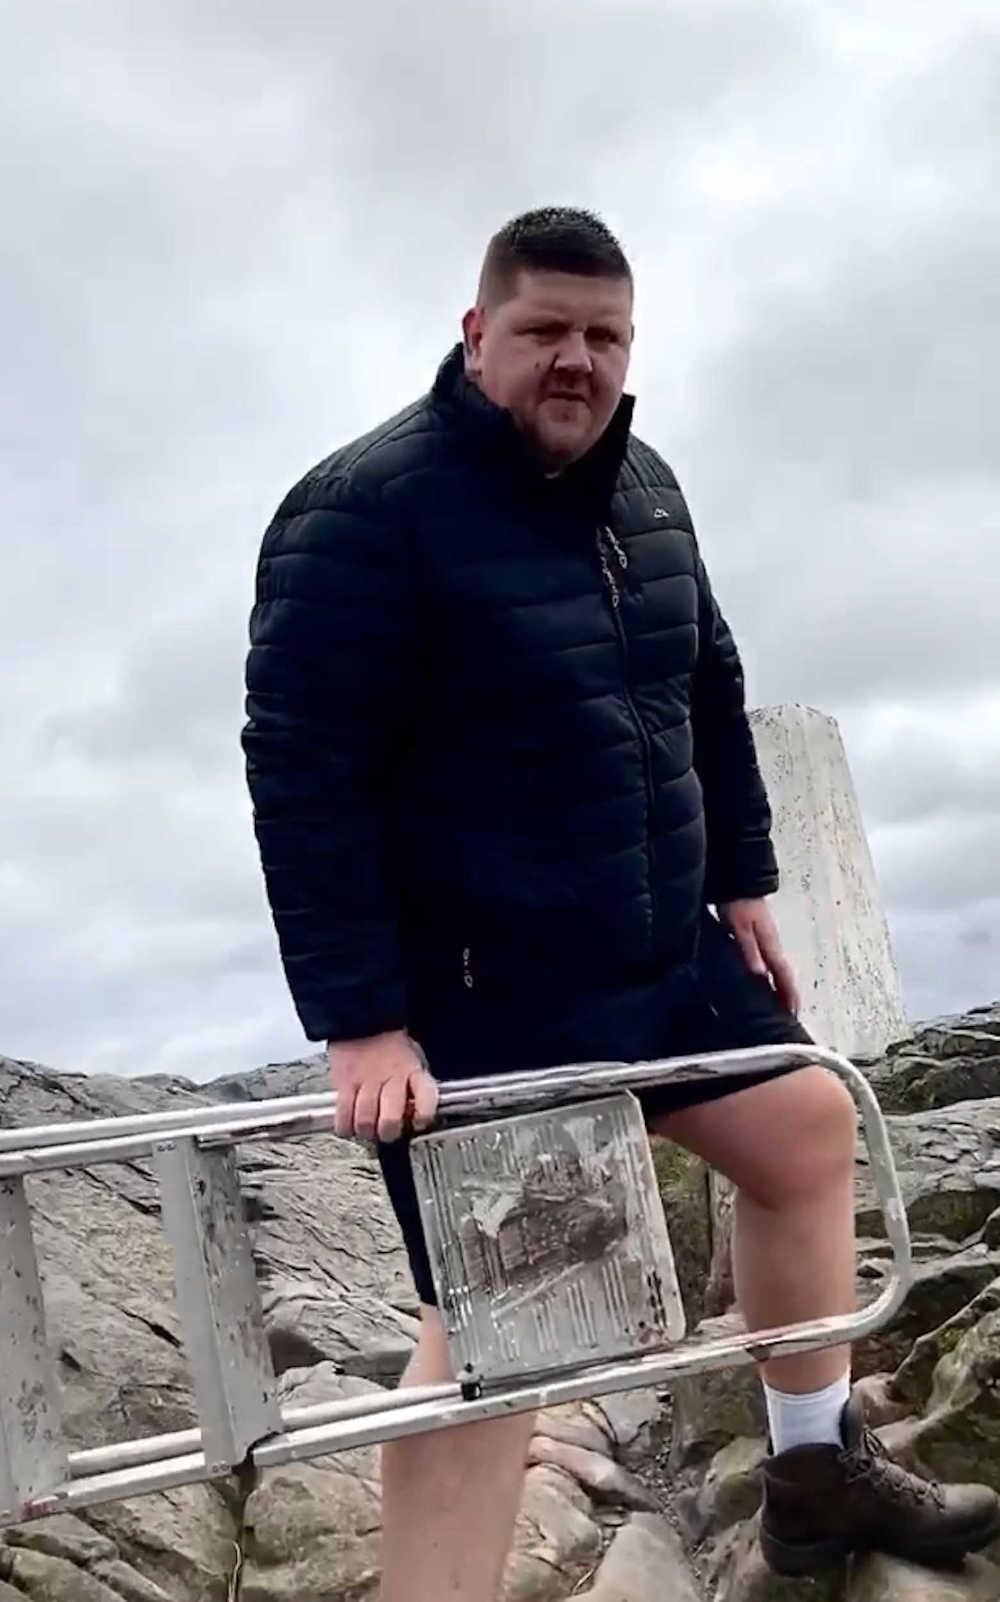 Dave Swan step ladder